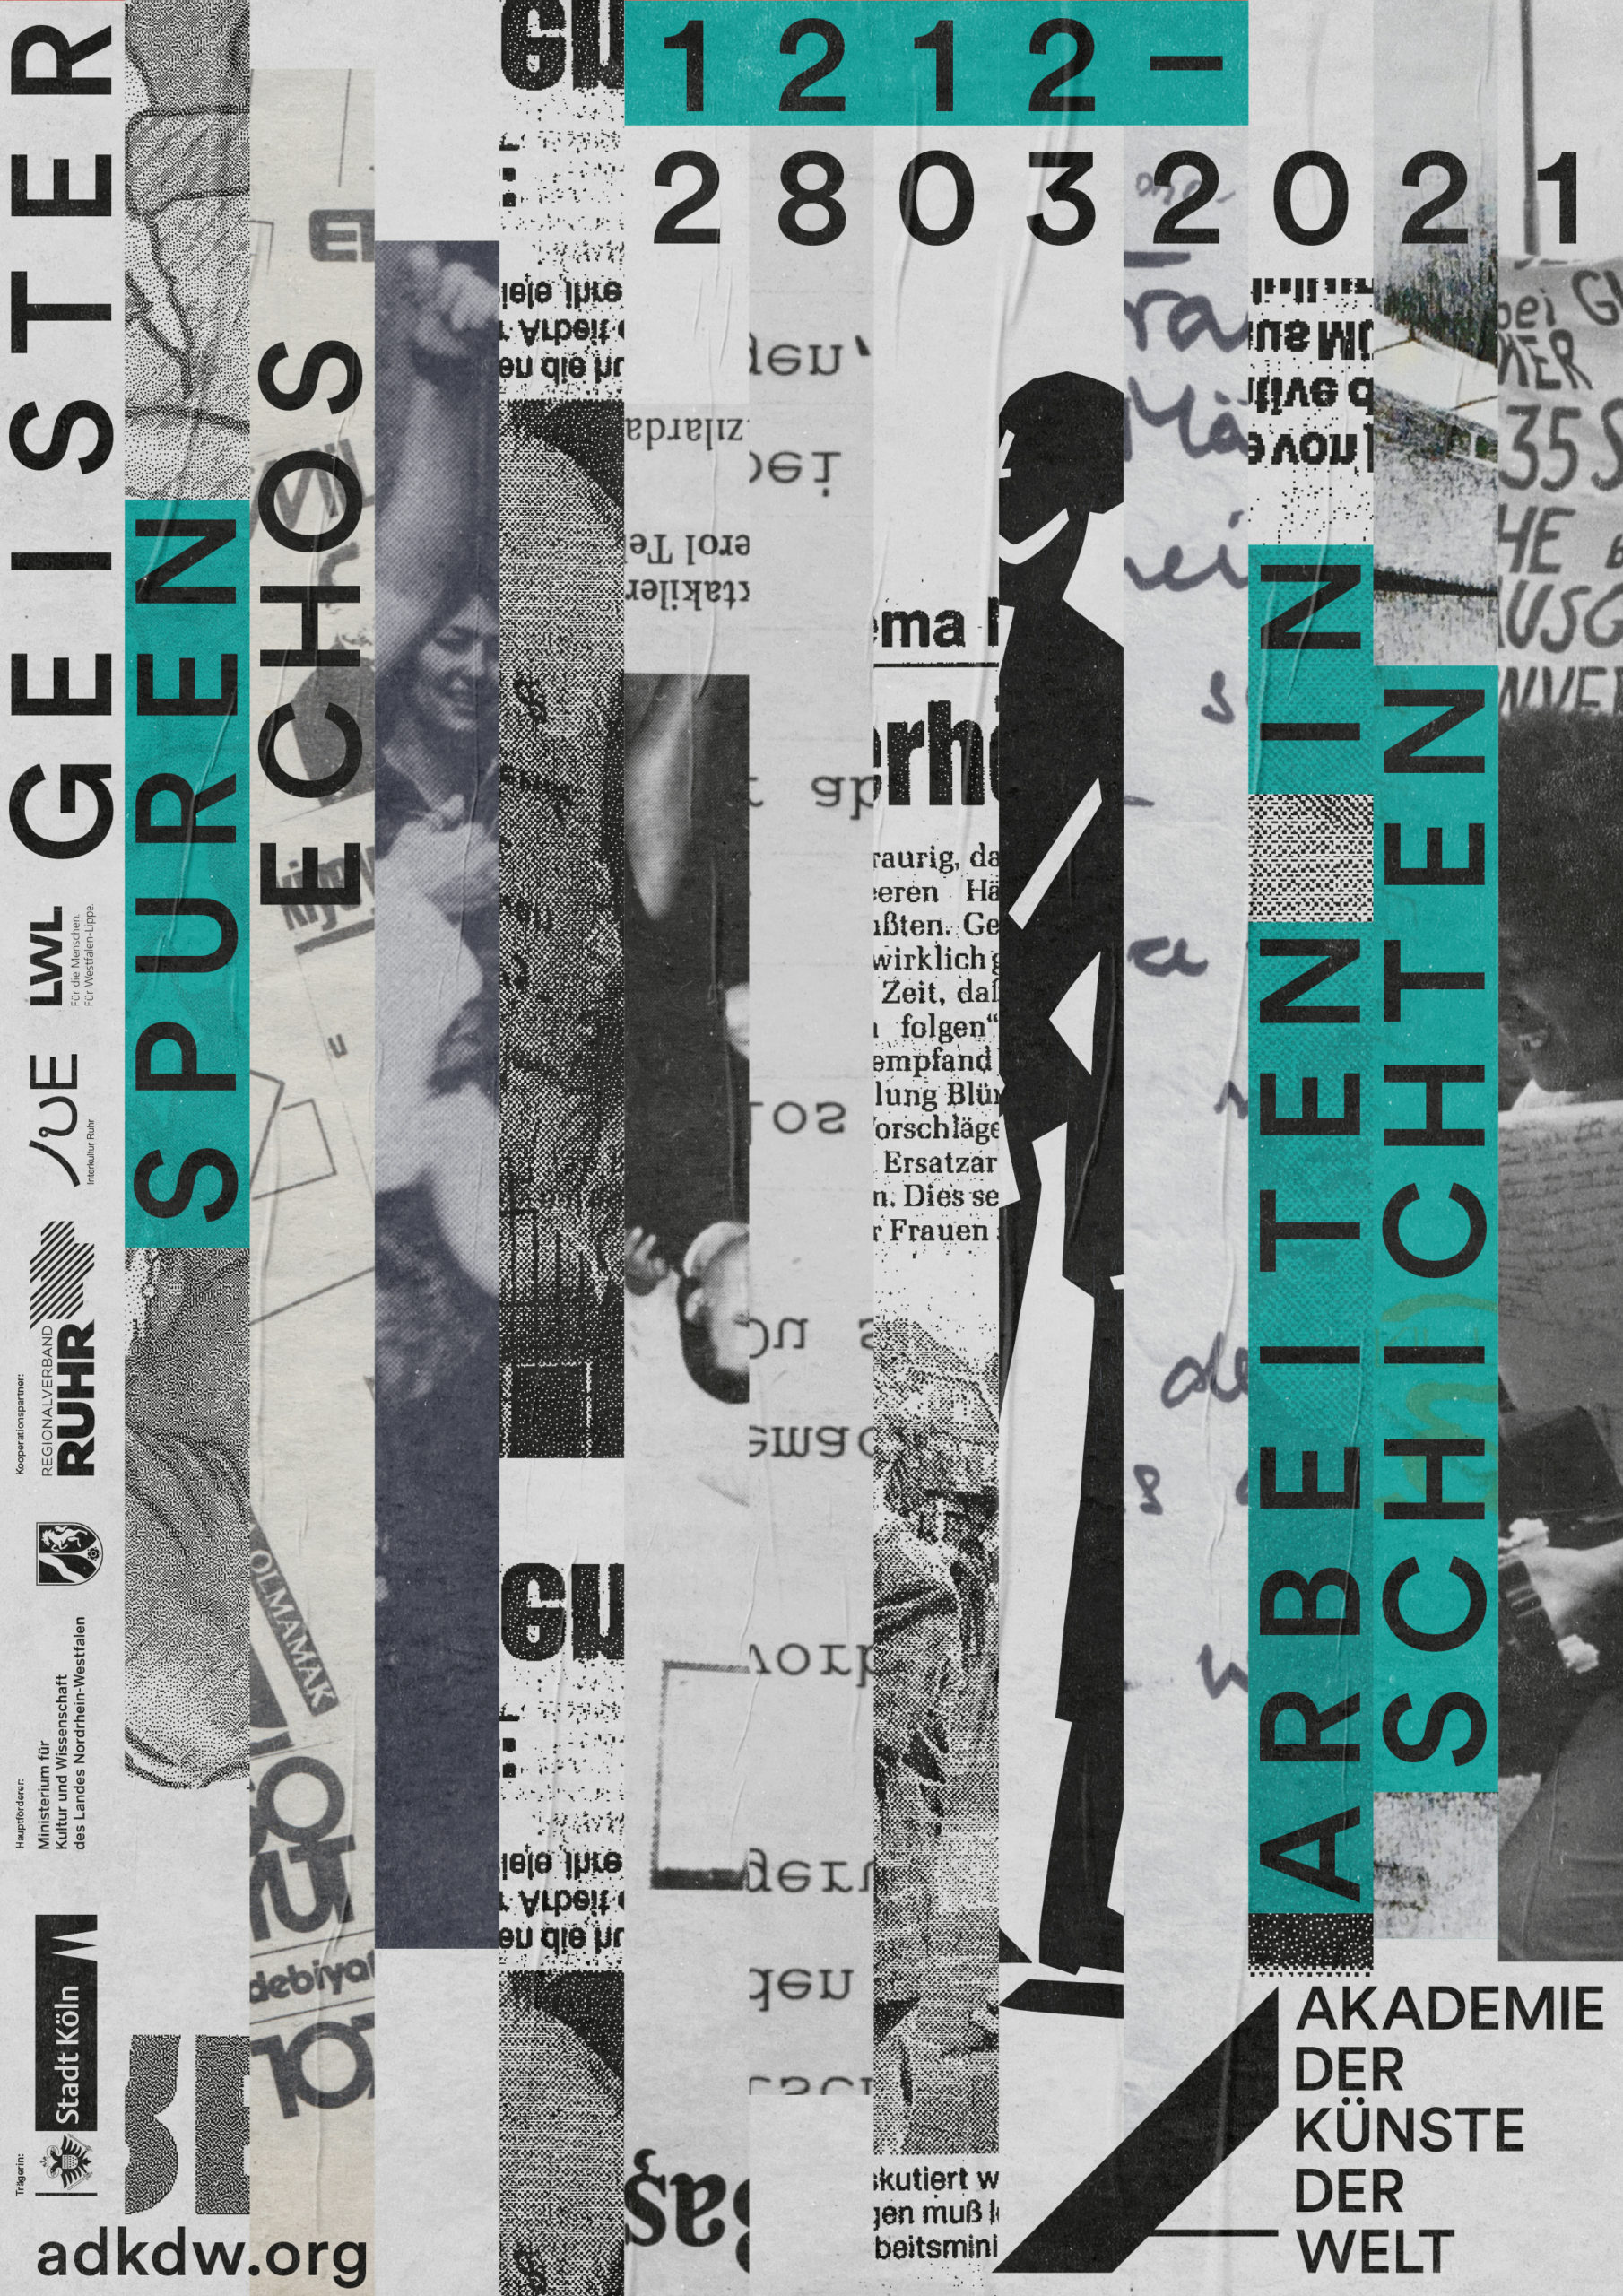 Plakat |Spuren | Strasse |Köln